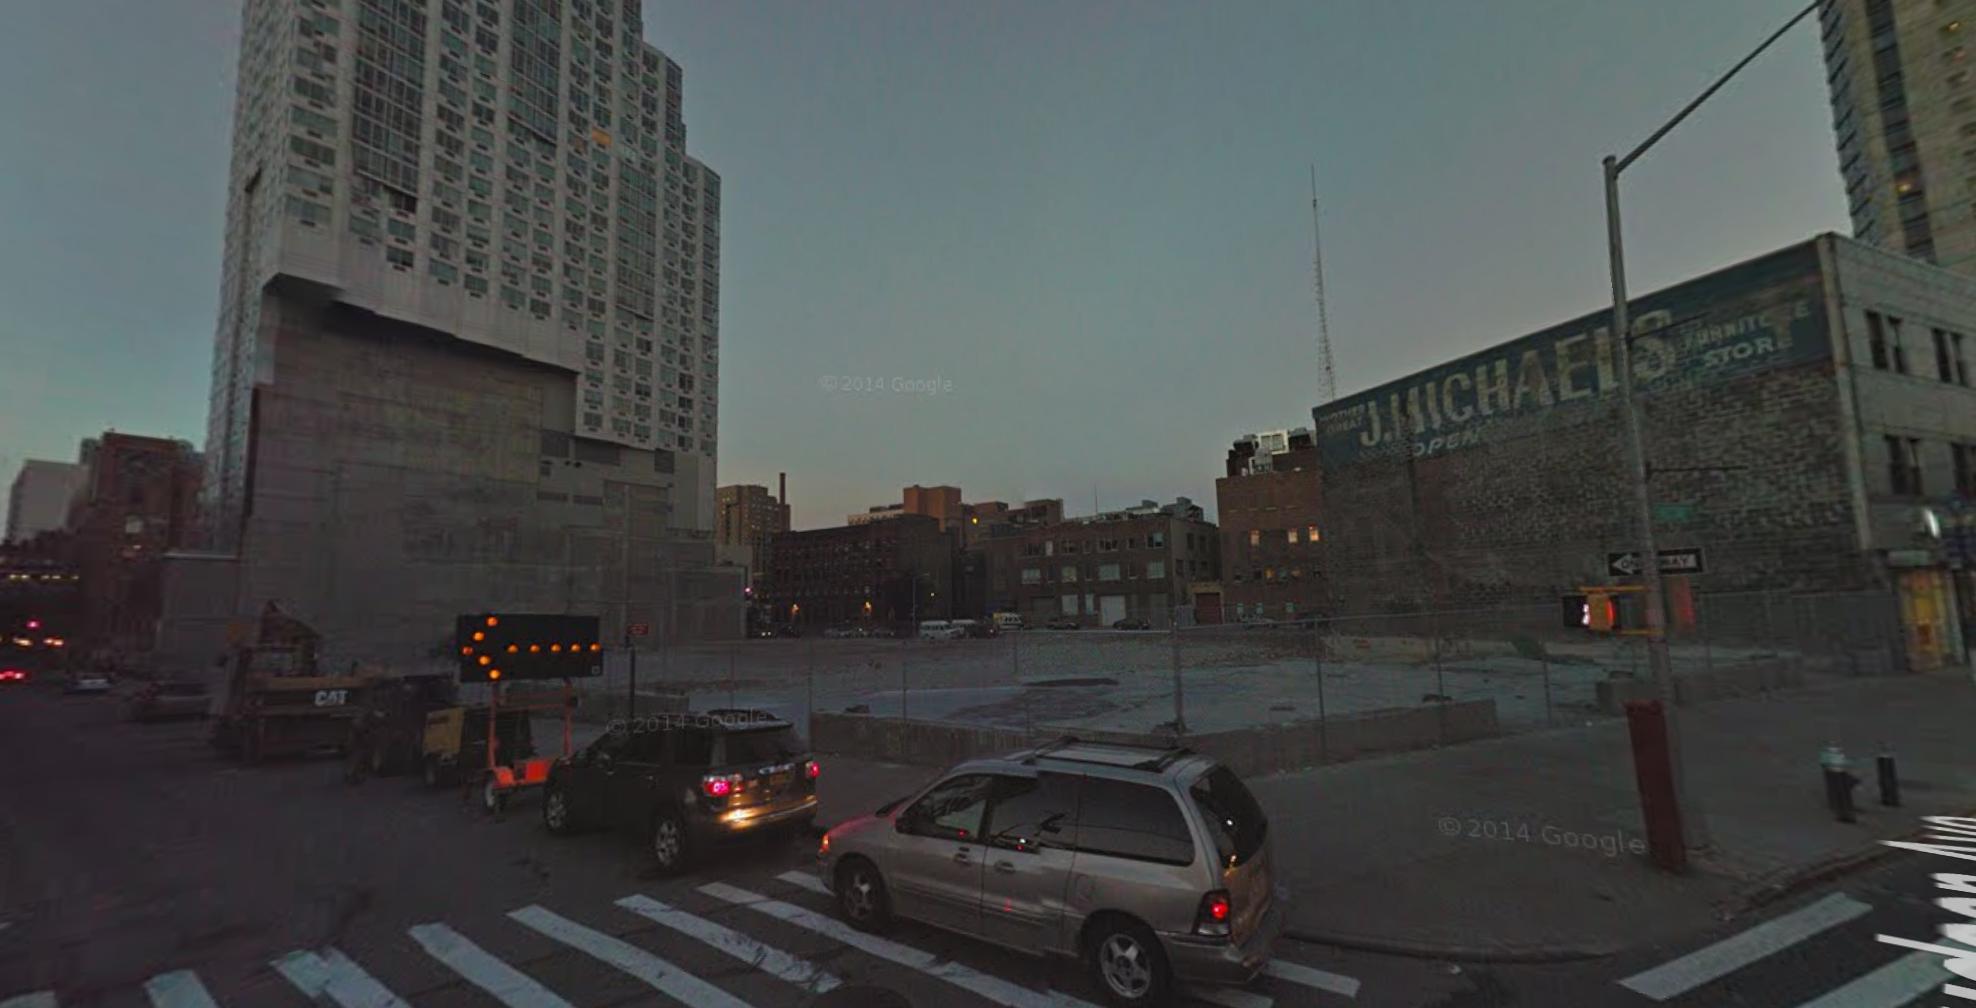 625 Fulton Street